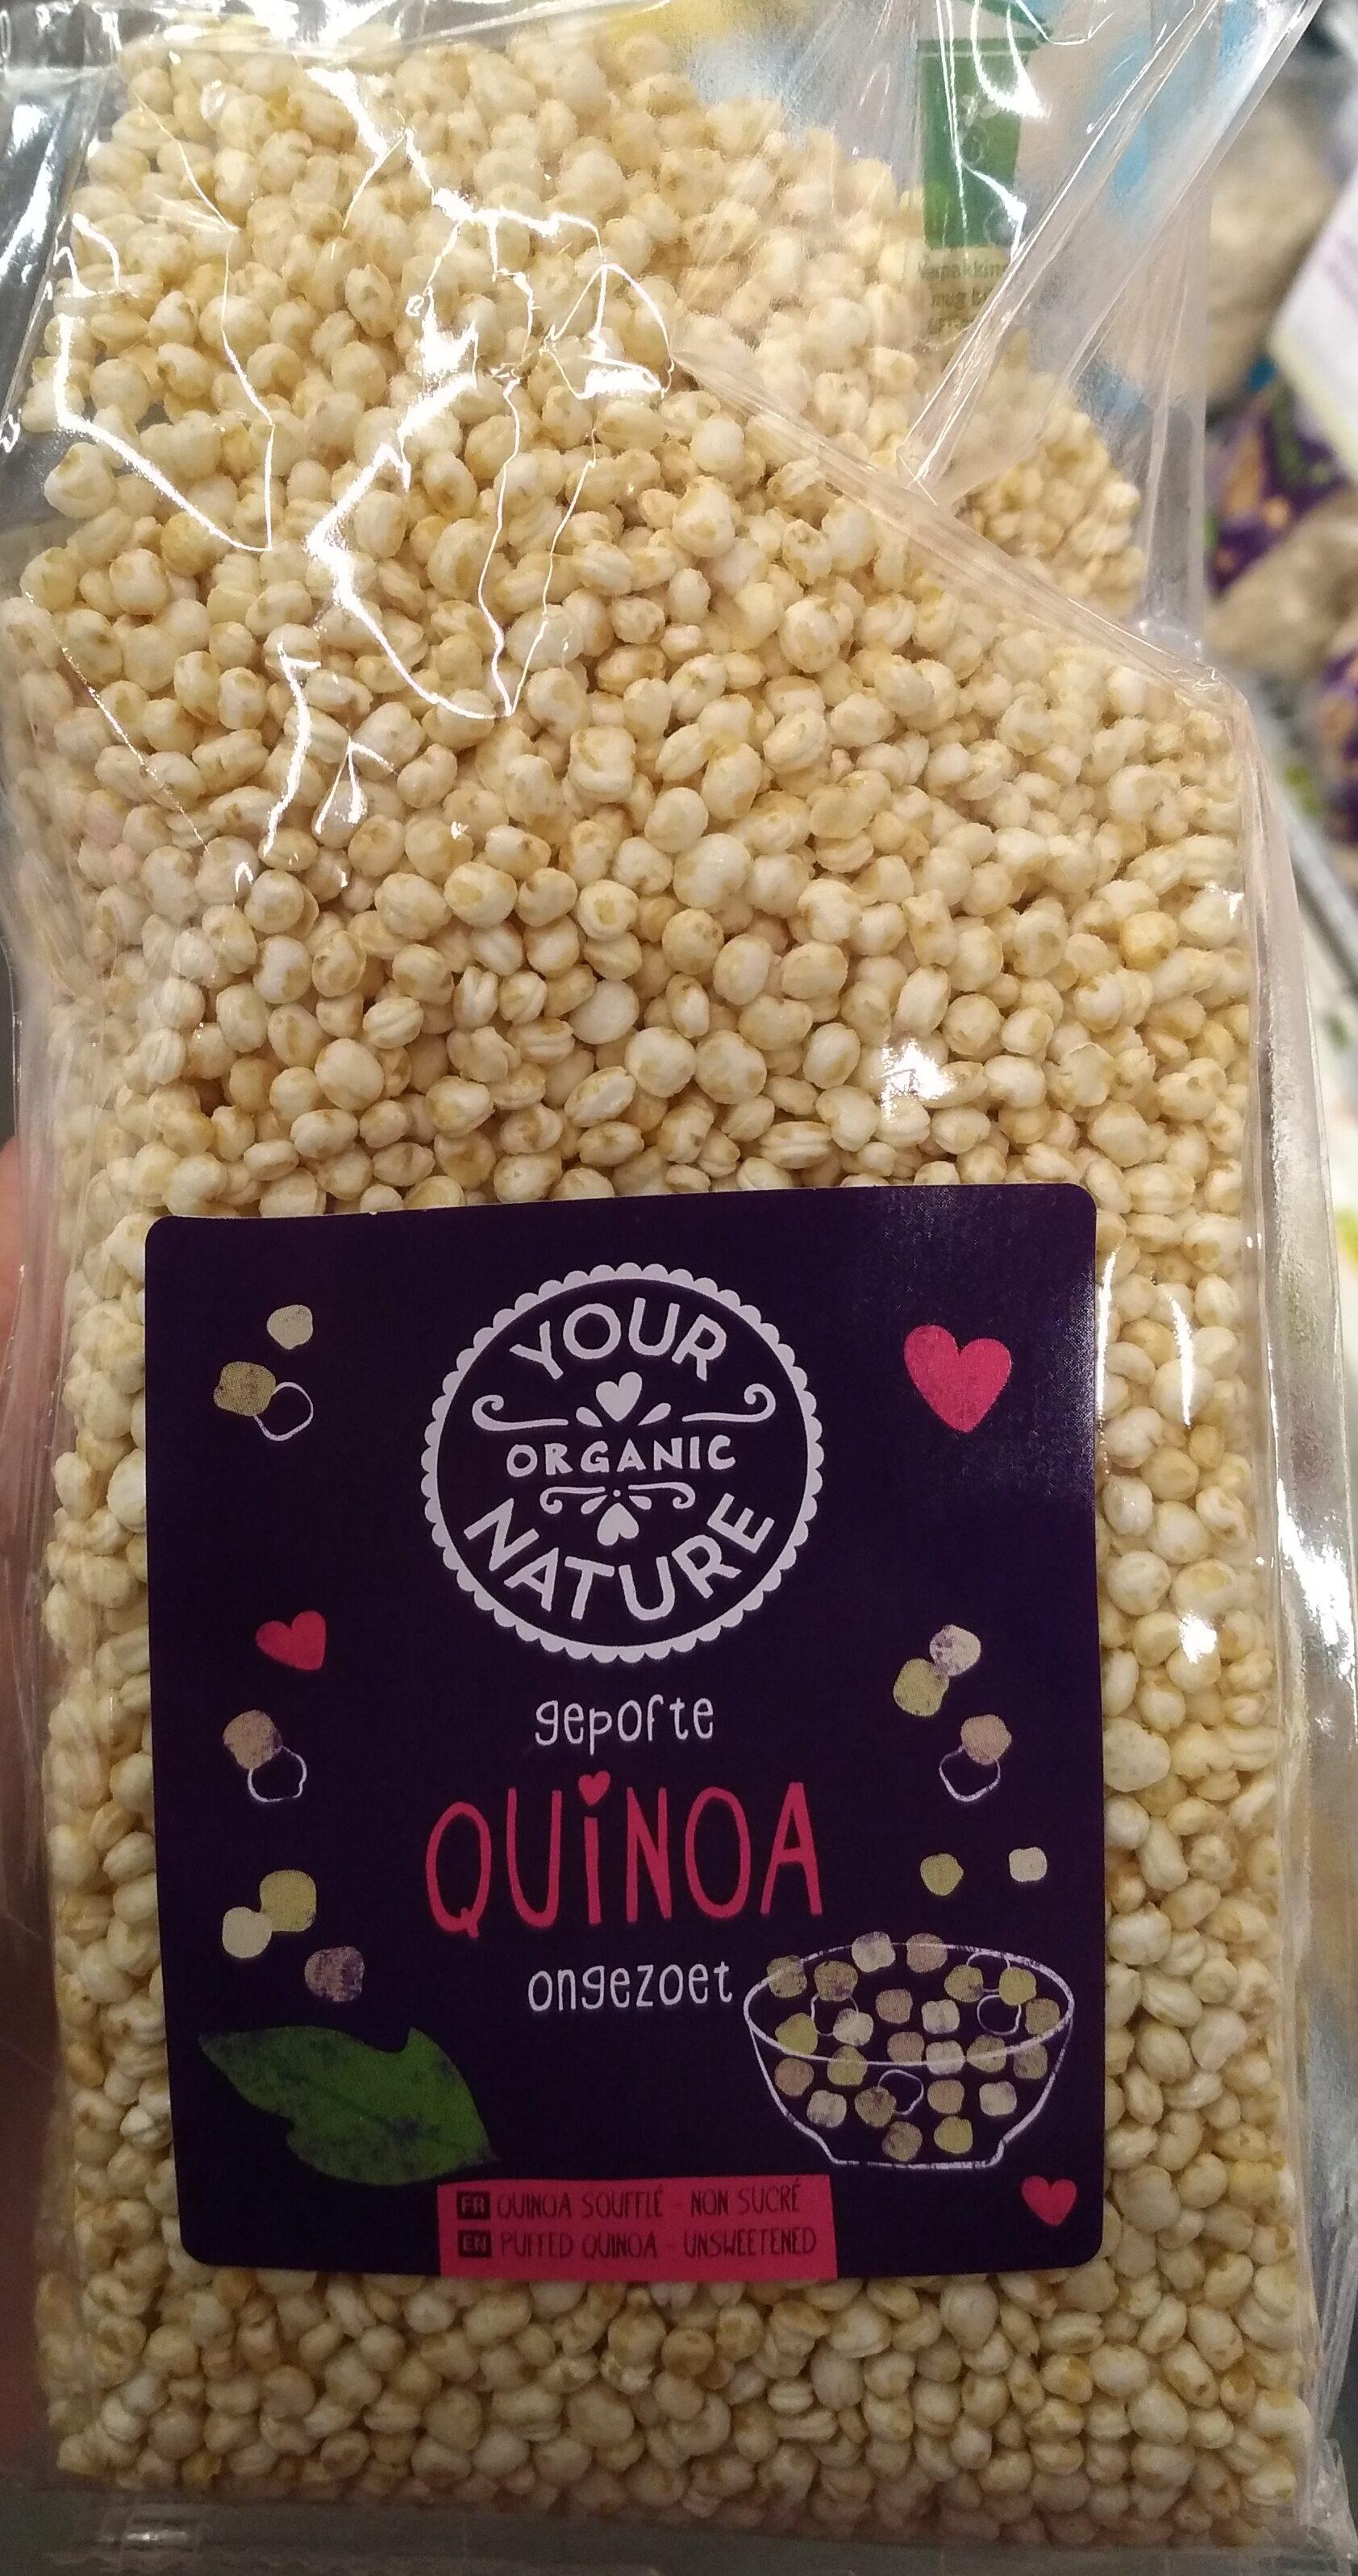 Gepofte Quinoa ongezoet - Product - nl